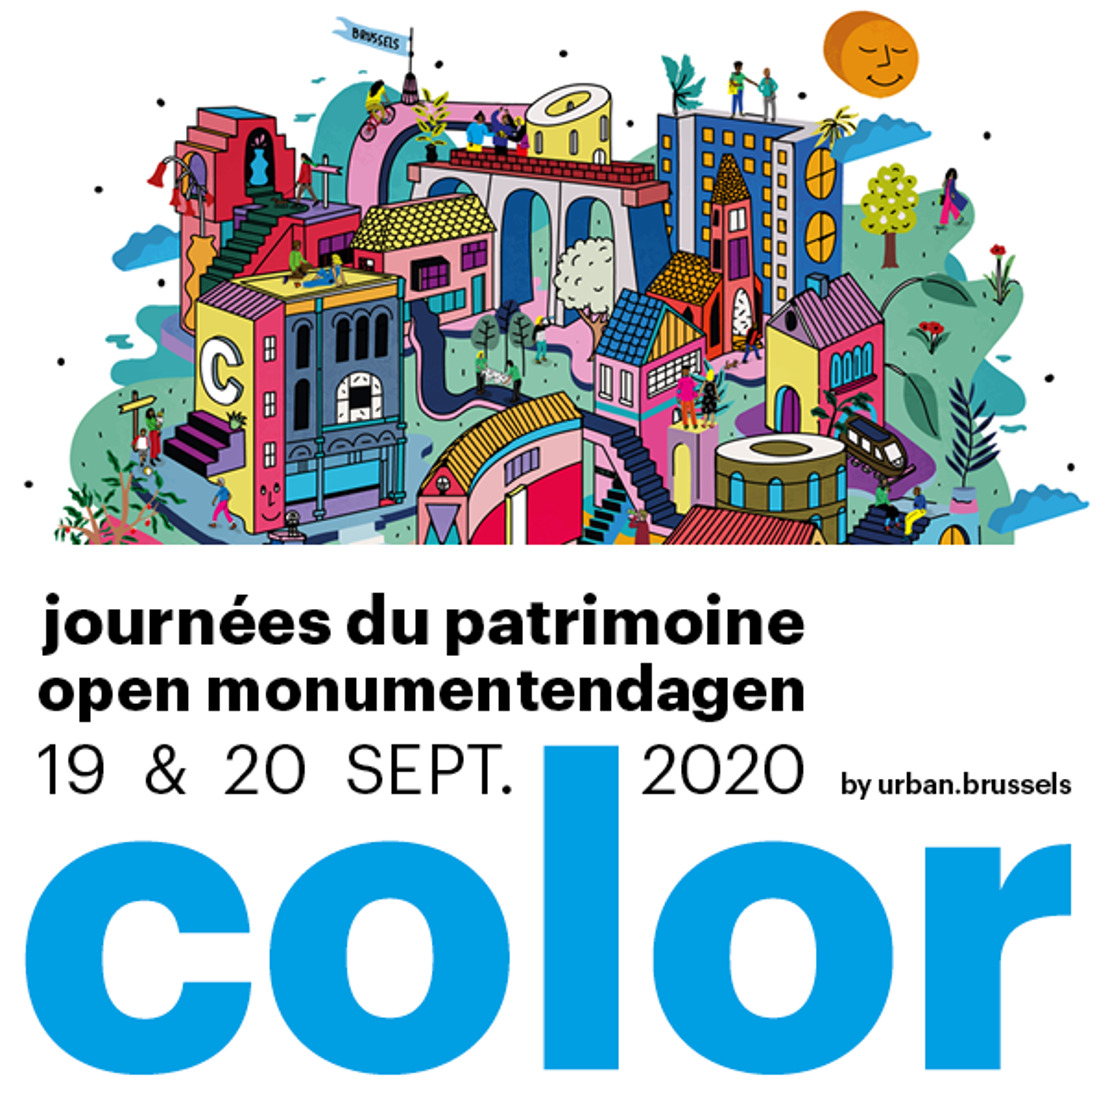 Open Monumentendagen 2020 in Brussel